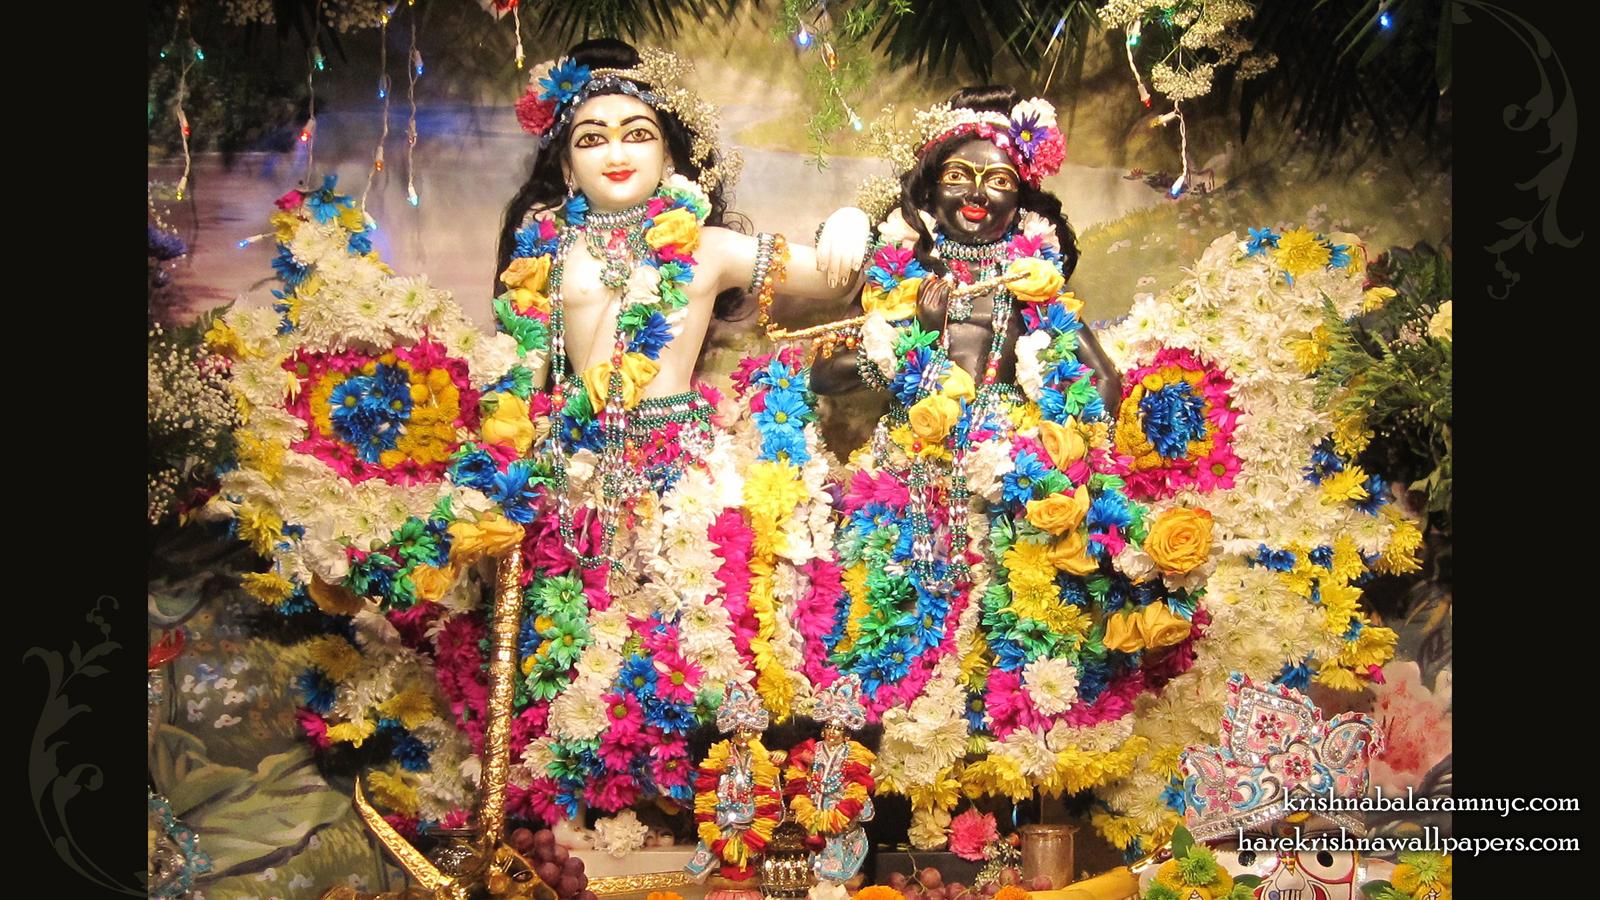 Sri Sri Hari Haladhari Wallpaper (002) Size 1600x900 Download